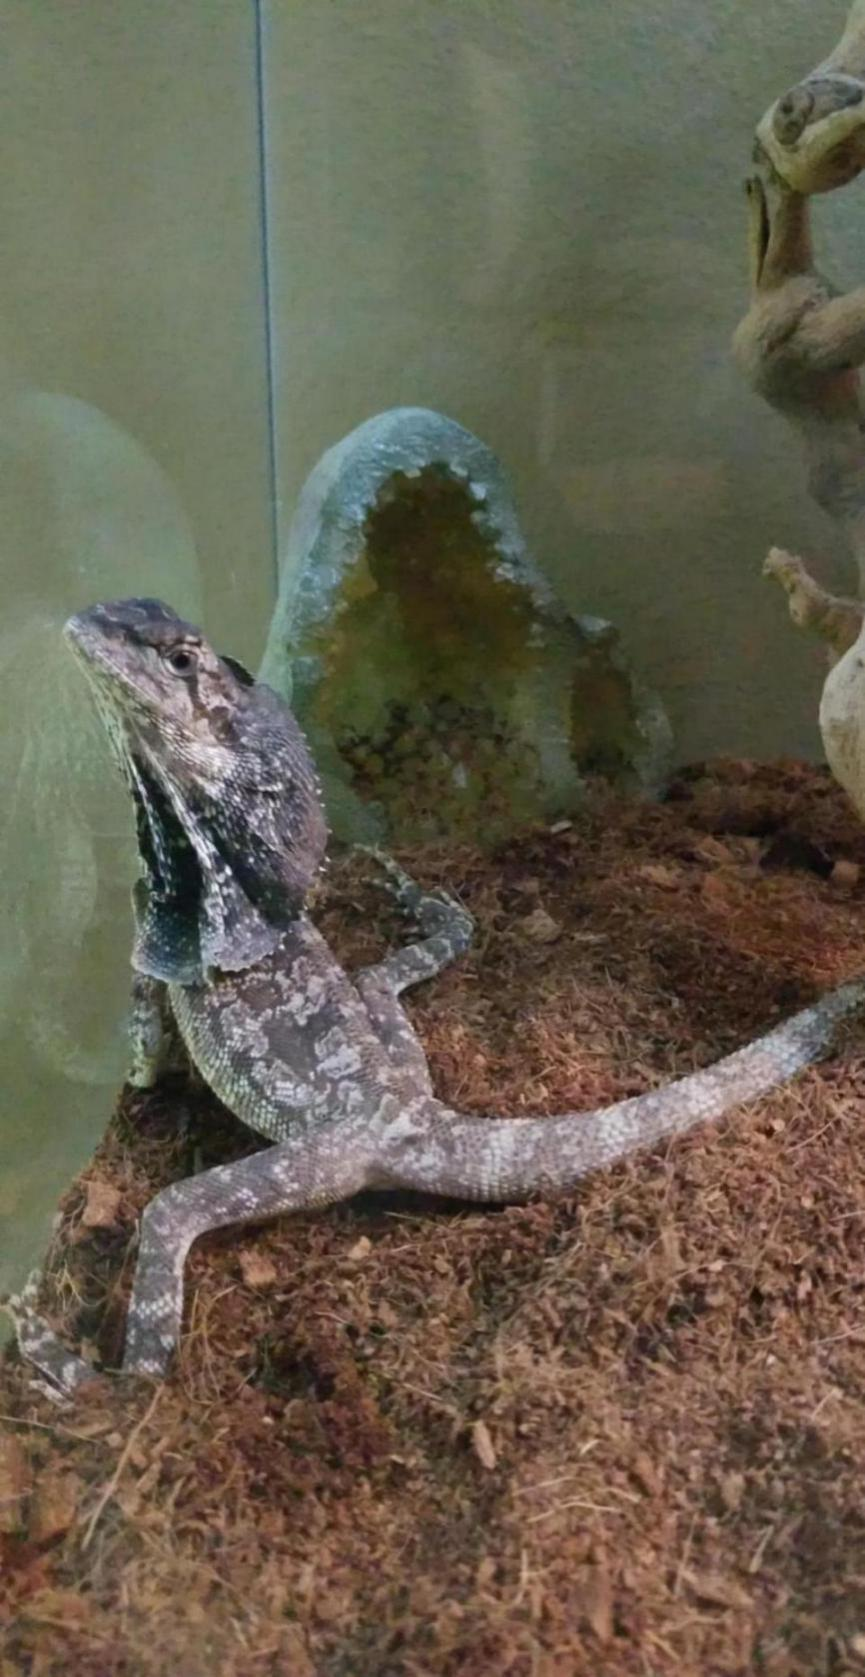 Male or Female frilled dragon?-snapchat-276603003_1528738805632.jpg